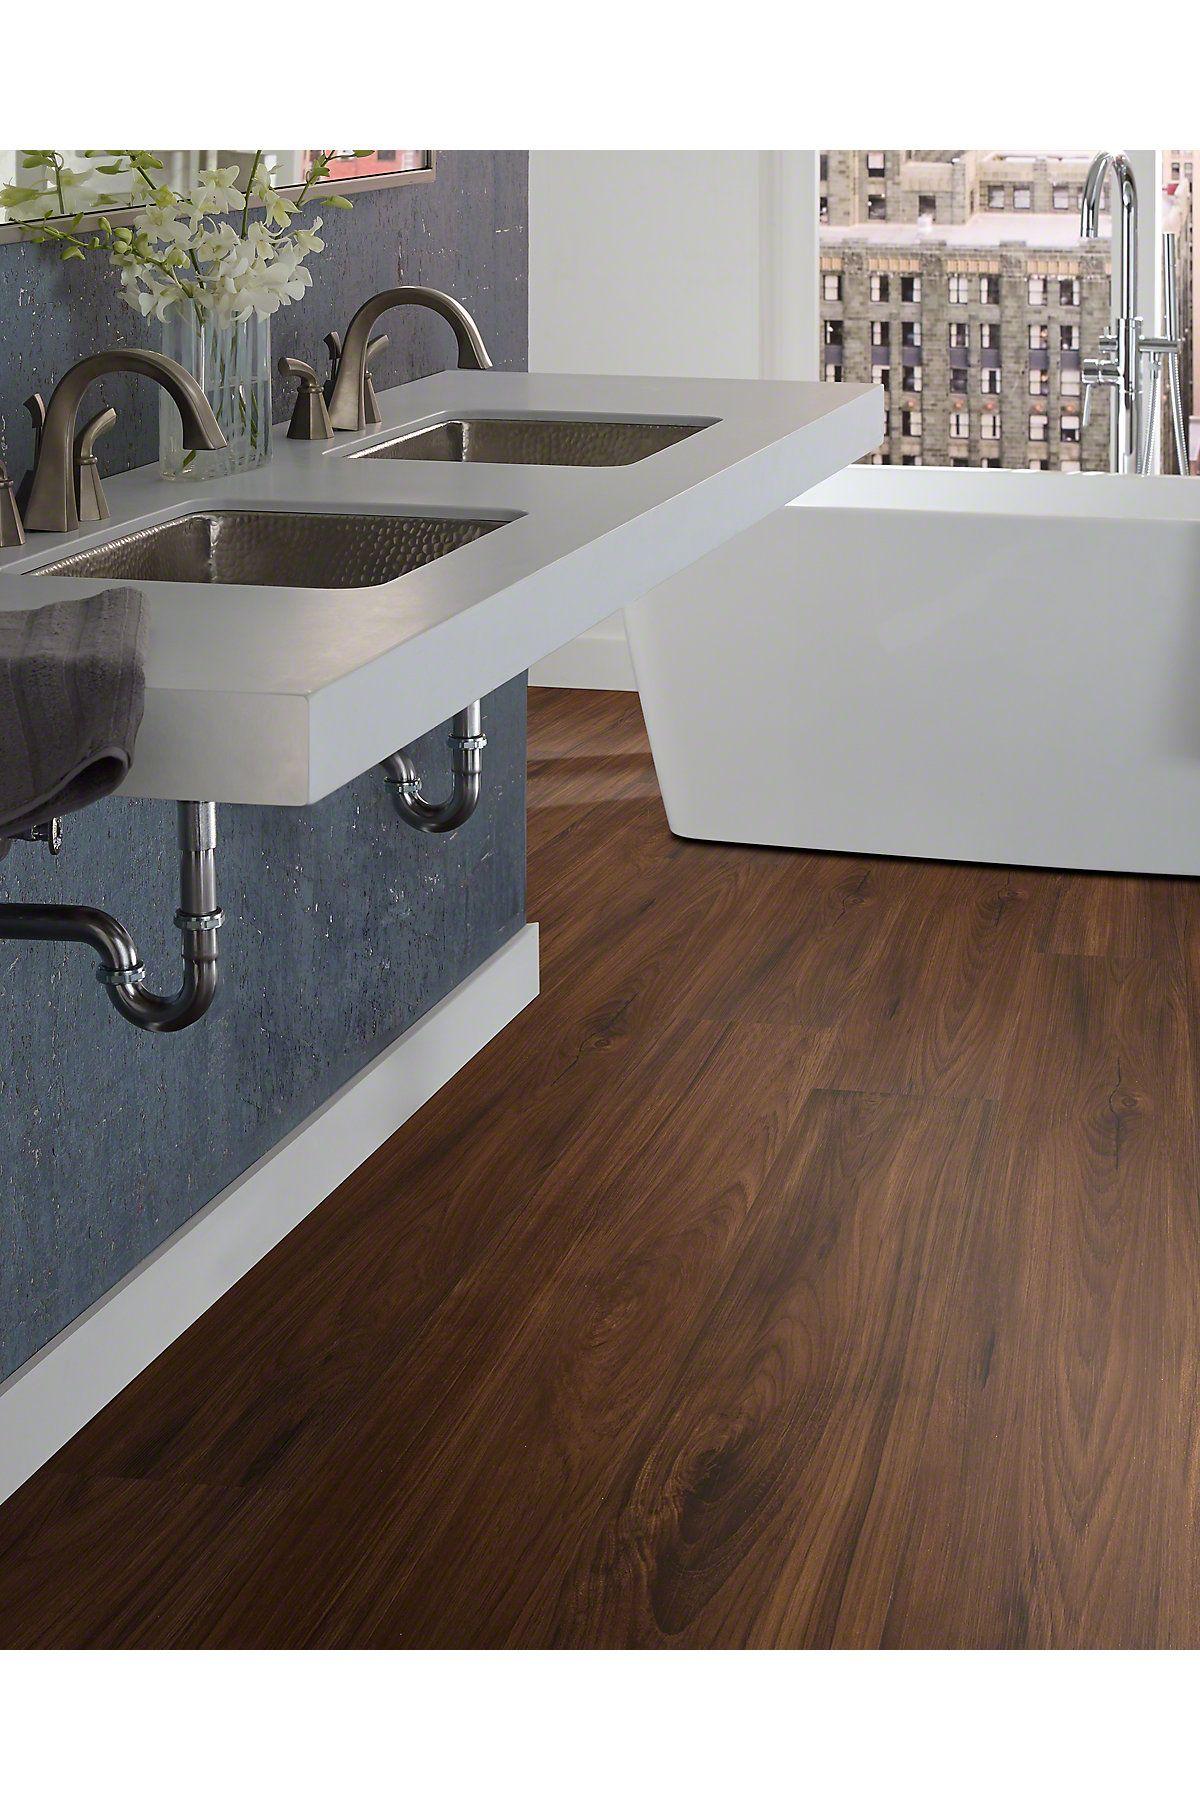 Cornerstone Plank Deep Mahogany Sa629 00703 Resilient Sample Vinyl Plank Plank Flooring Vinyl Plank Flooring